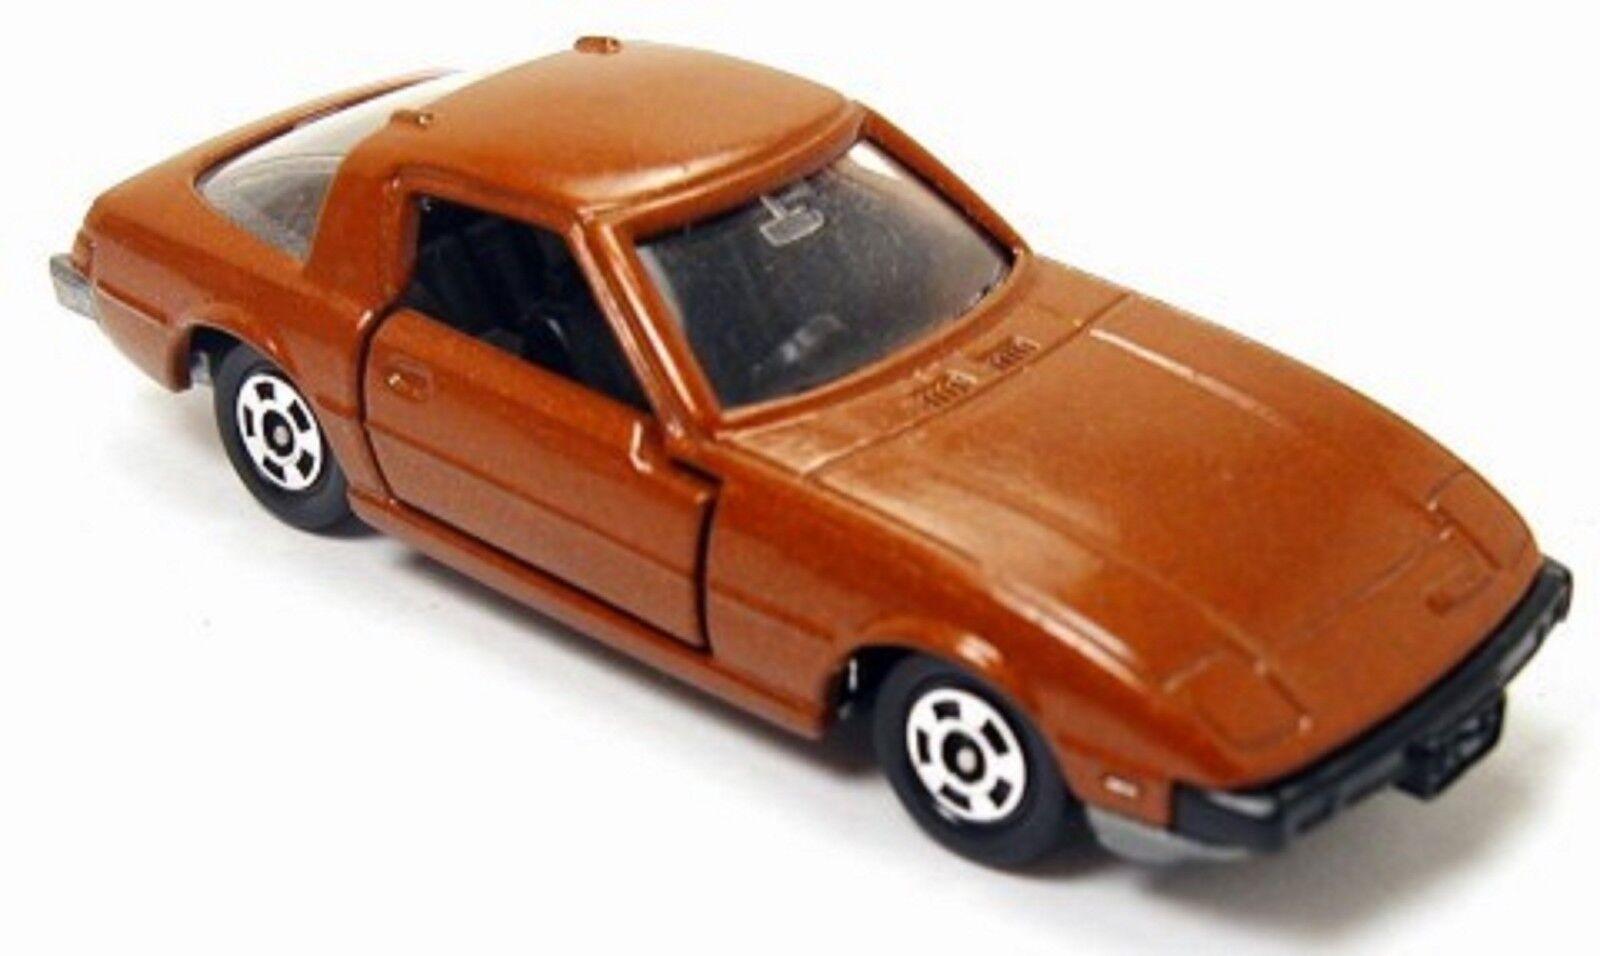 Mazda RX-7 Savanna Tomica Tomy 1979 Brown Japan Only